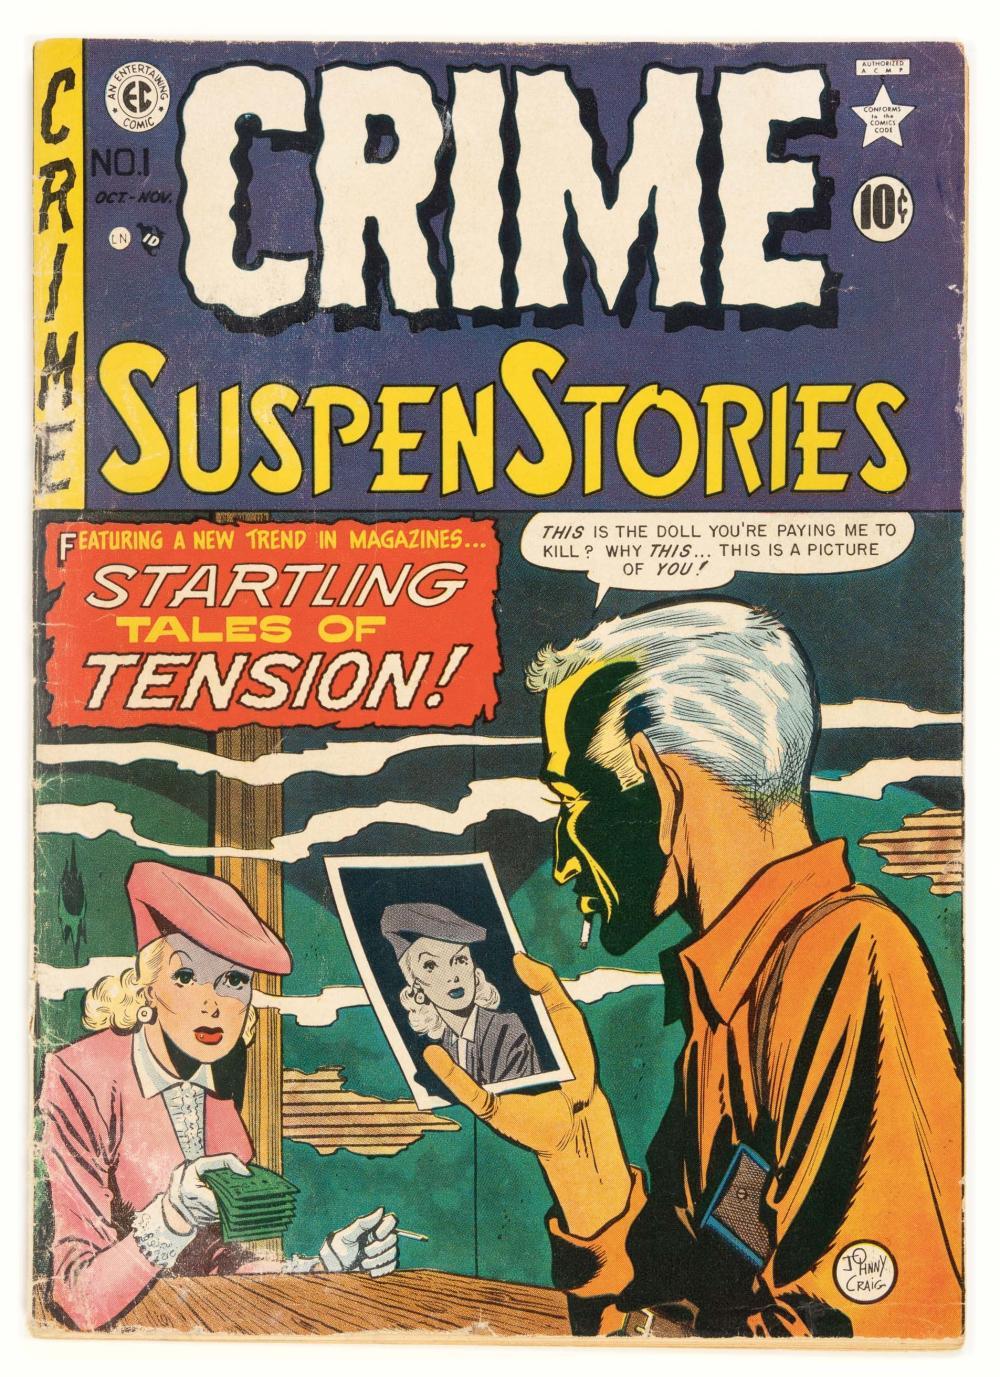 CRIME SUSPENSTORIES #1 * 1.5 * 1st State Variant * Color Touch